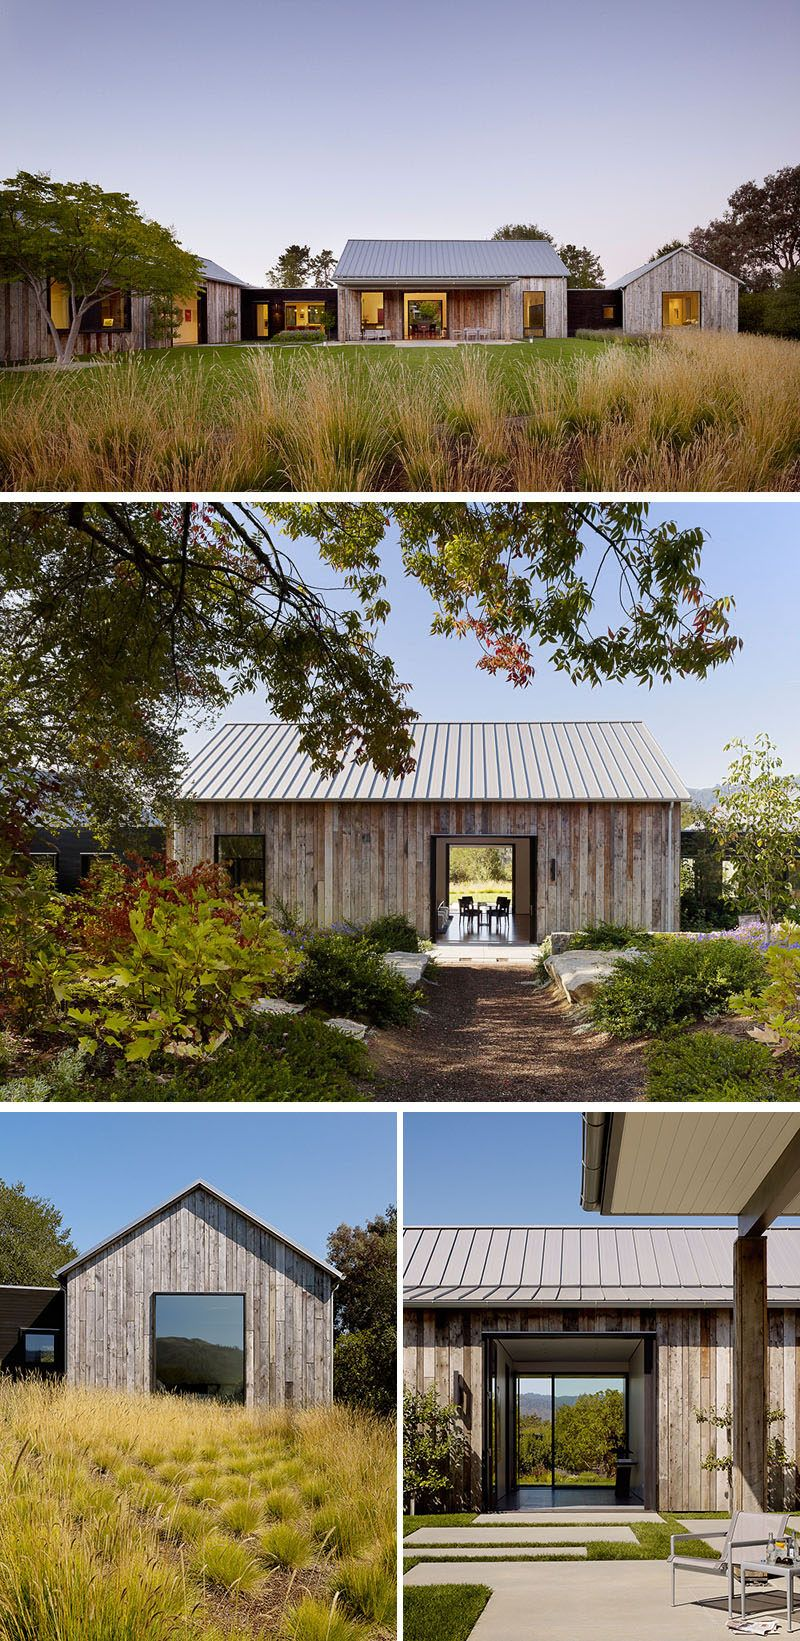 The Portola Valley Barn by Walker Warner Architects